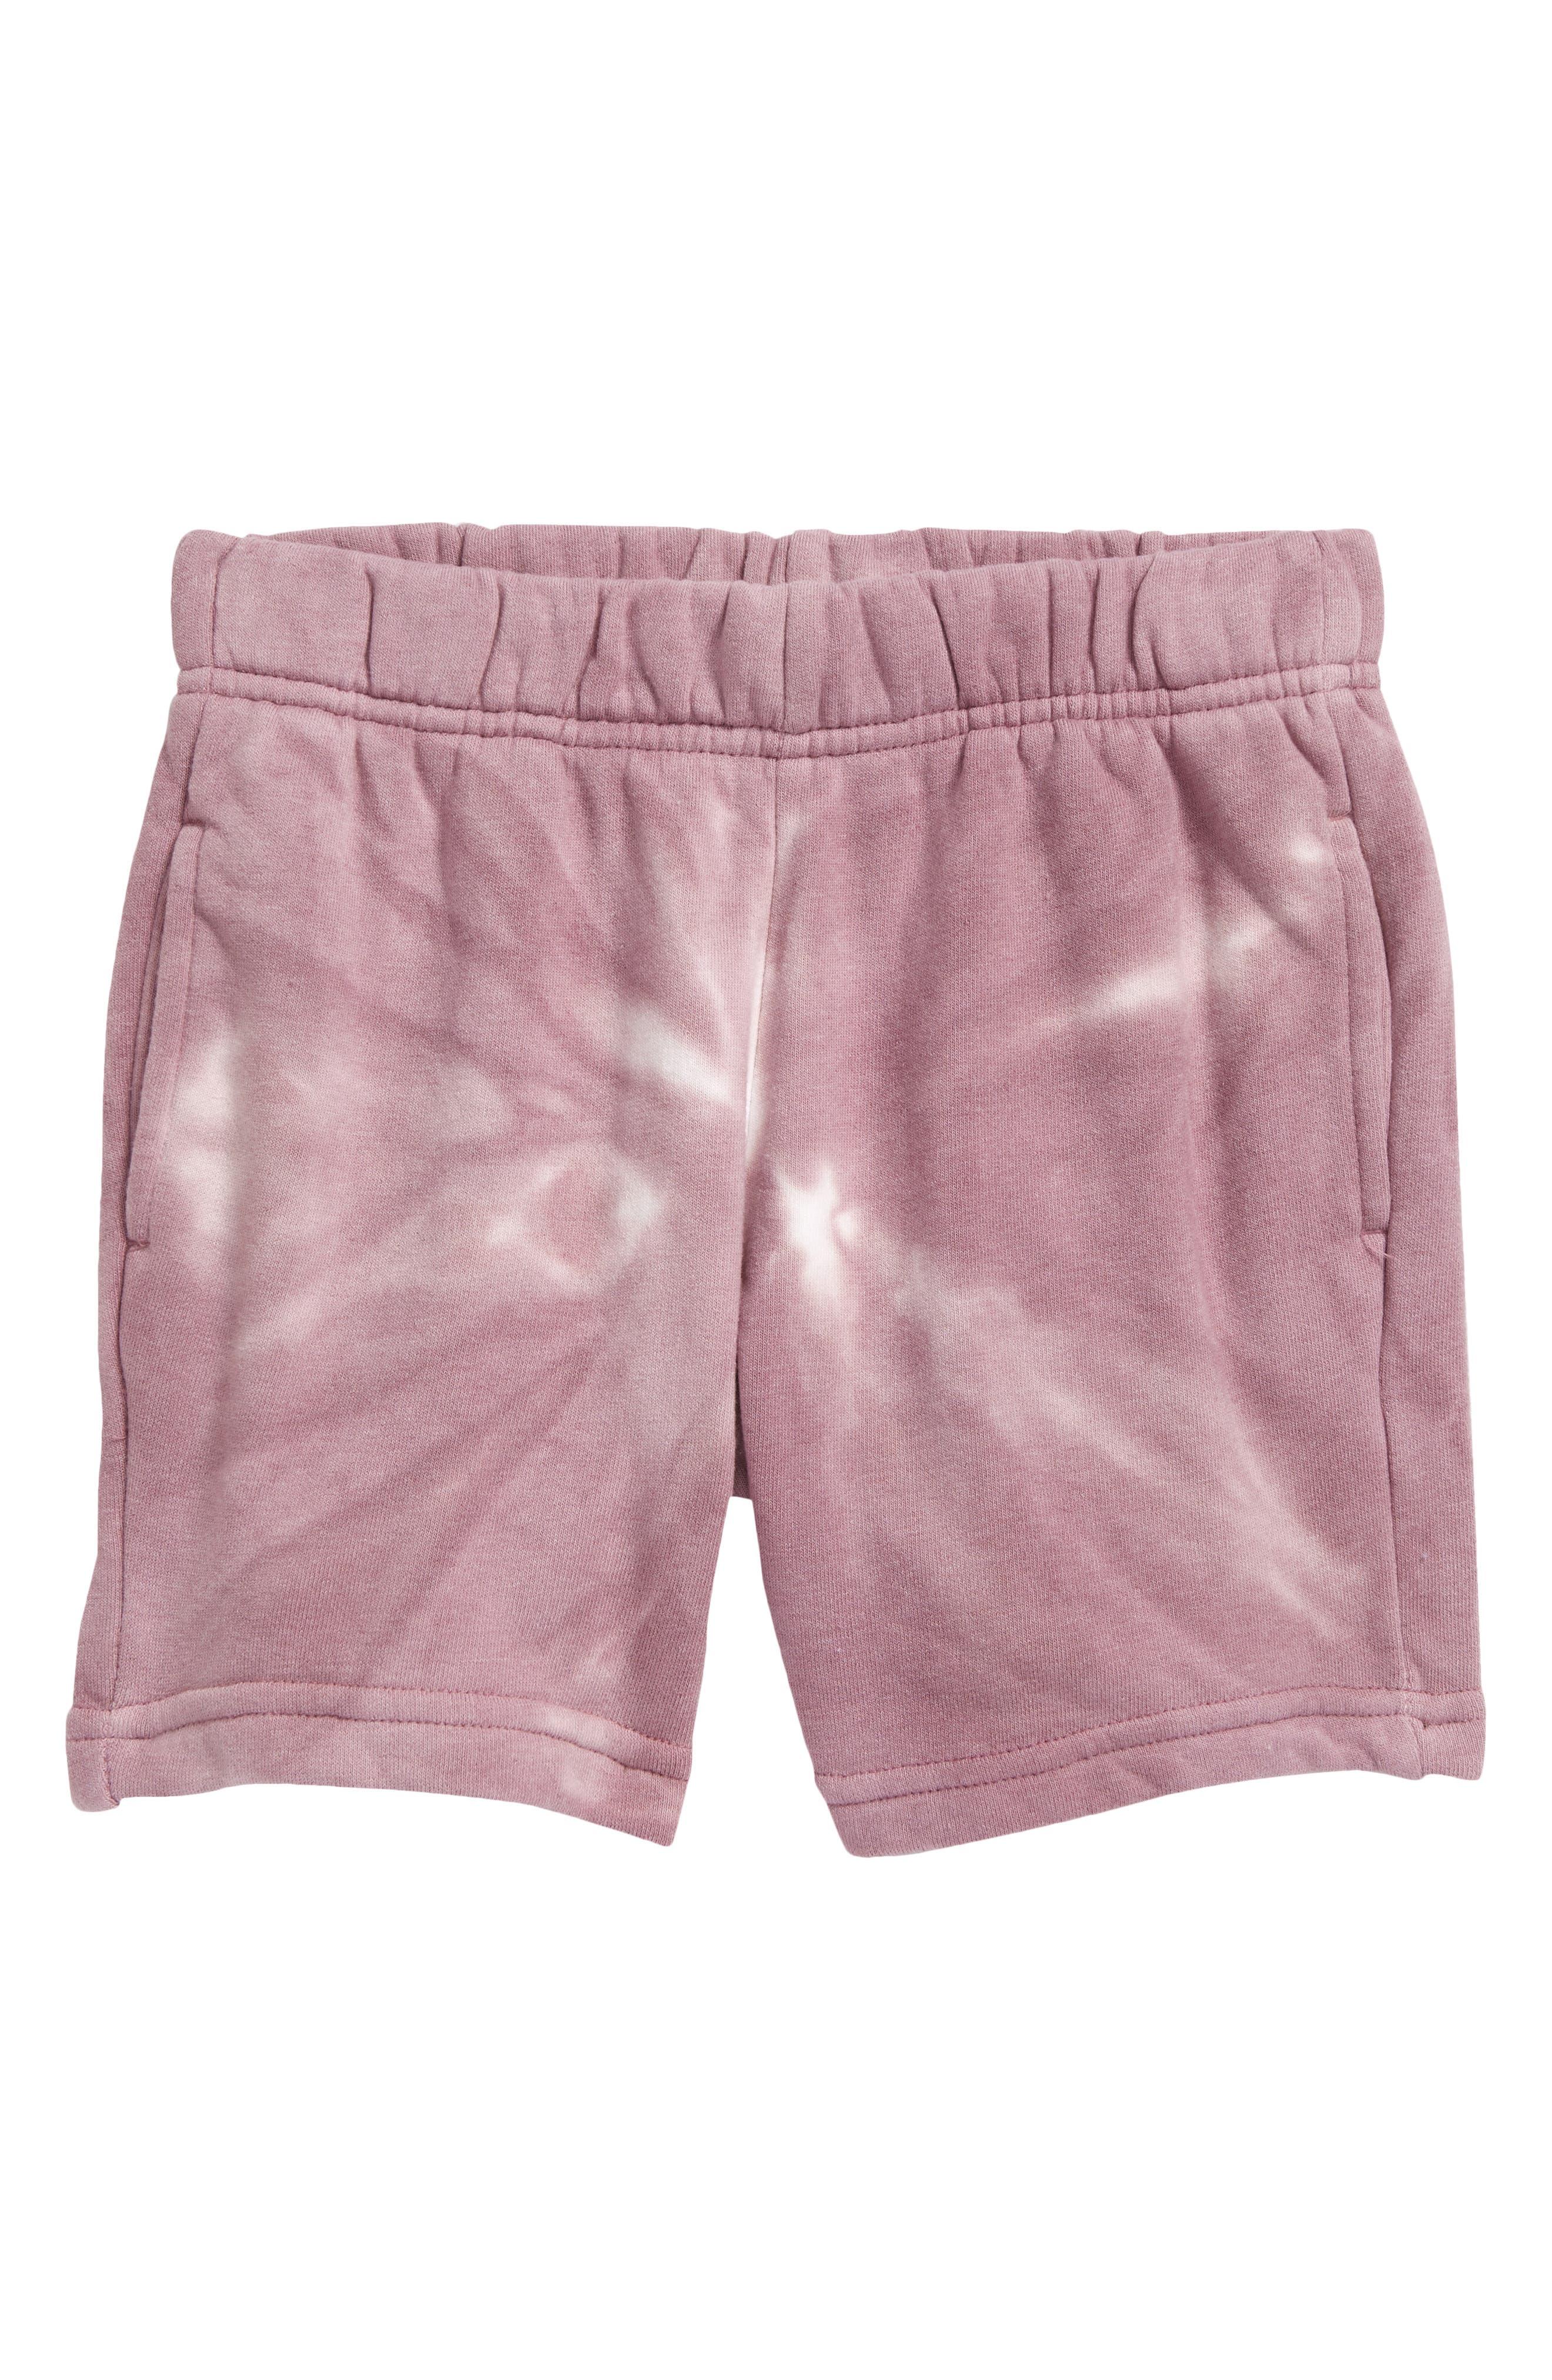 Kids' Tie Dye Recycled Cotton Blend Fleece Shorts